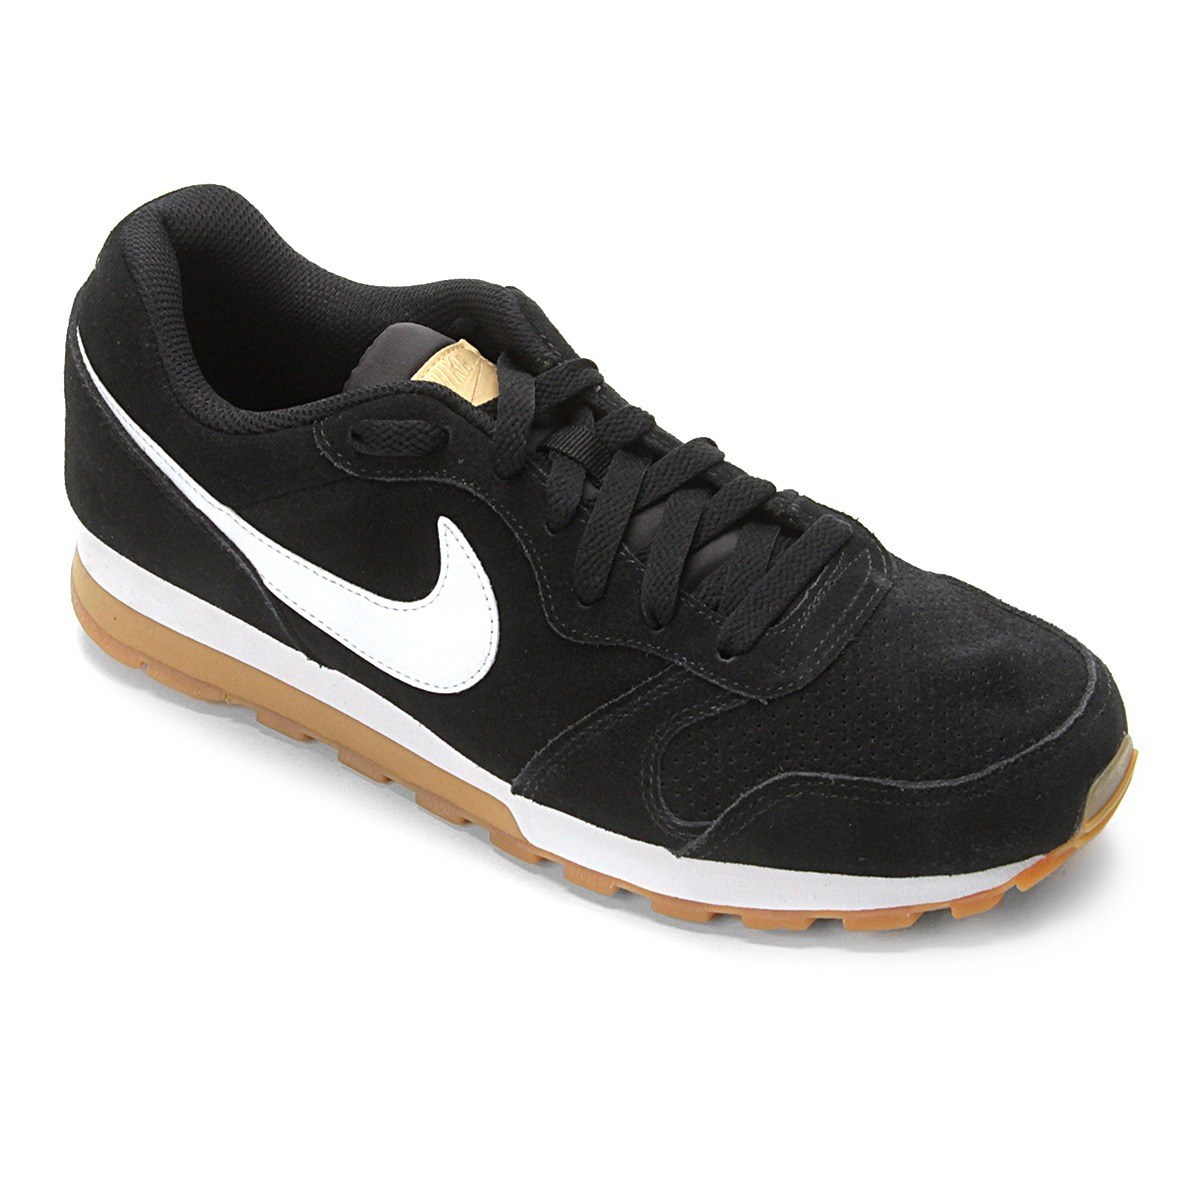 c00c65633 tênis nike md runner 2 suede masculino - preto e branco. Carregando zoom.